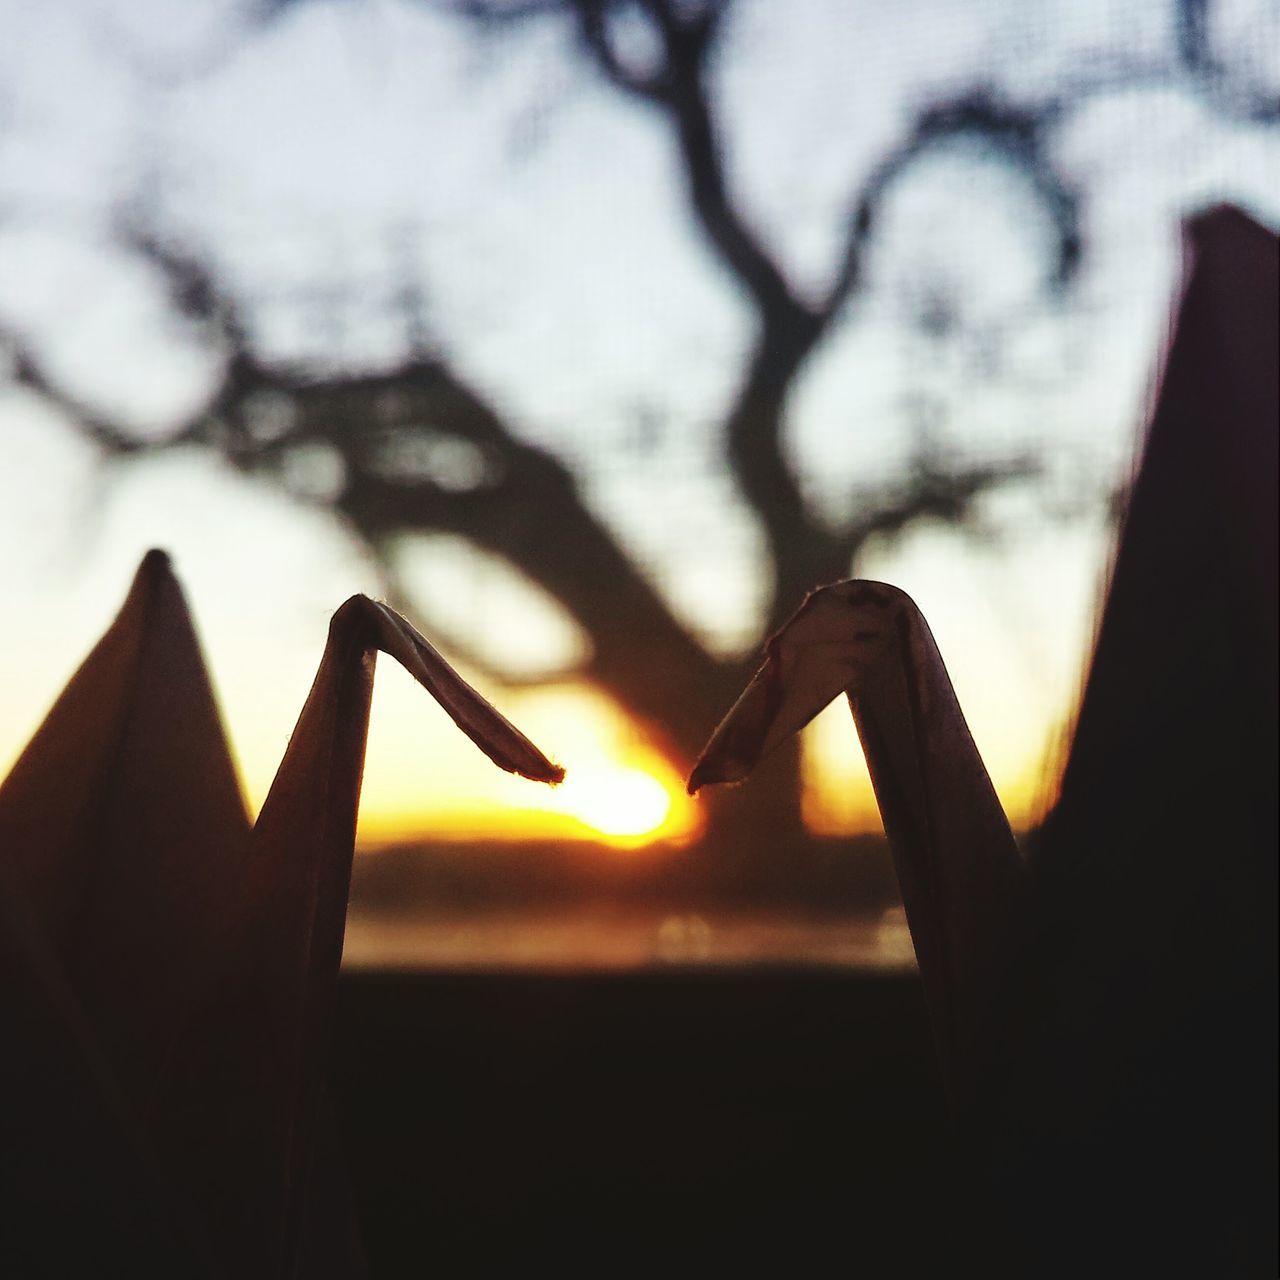 Origami Cranes Origami Sunset Sunset Silhouettes Closeup Closeupshot Macro Silhouette Love Birds